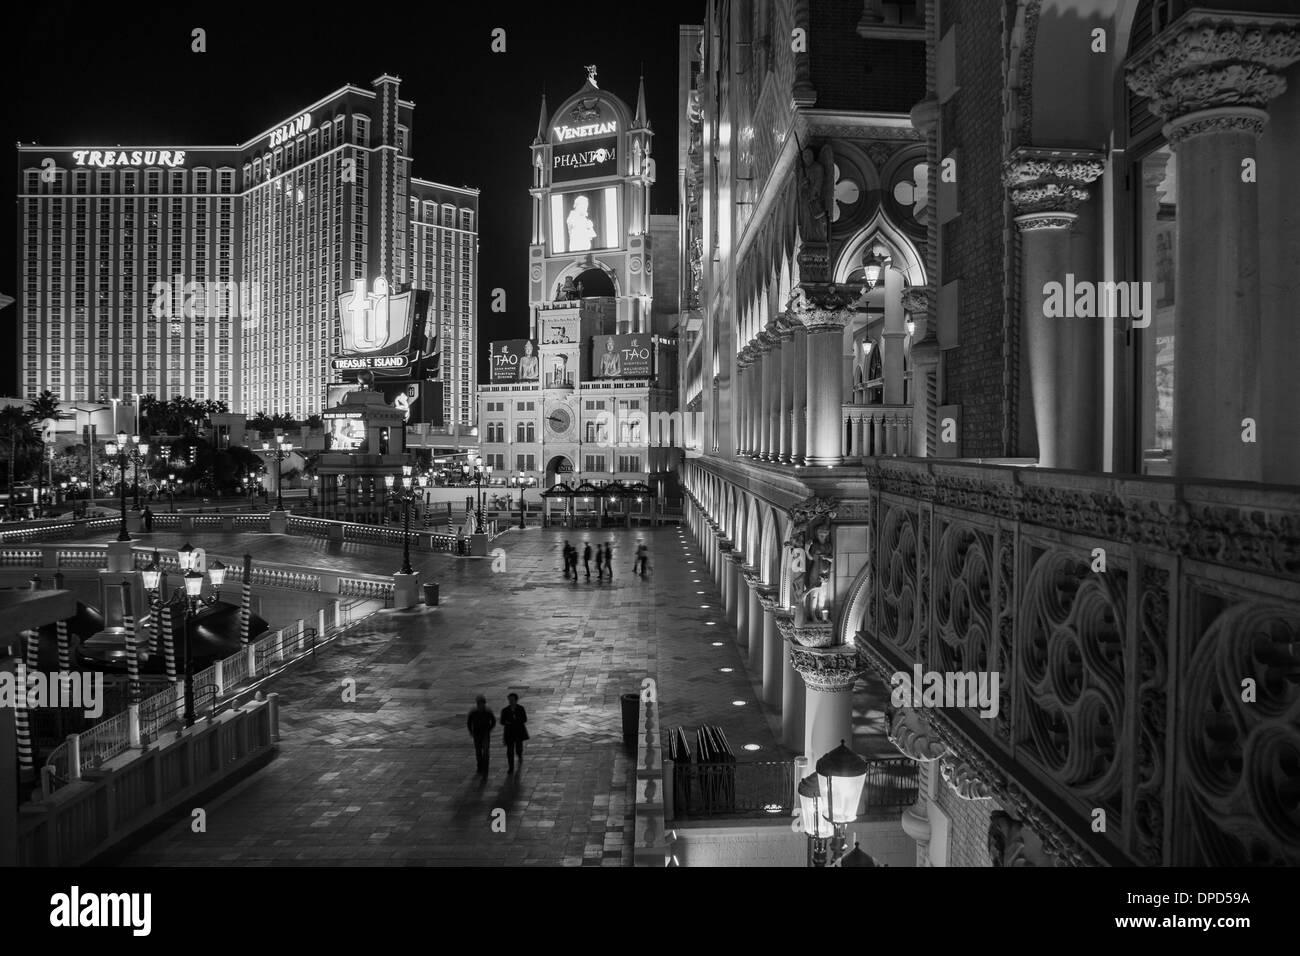 Venetian Hotel in Las Vegas, Nevada - Stock Image